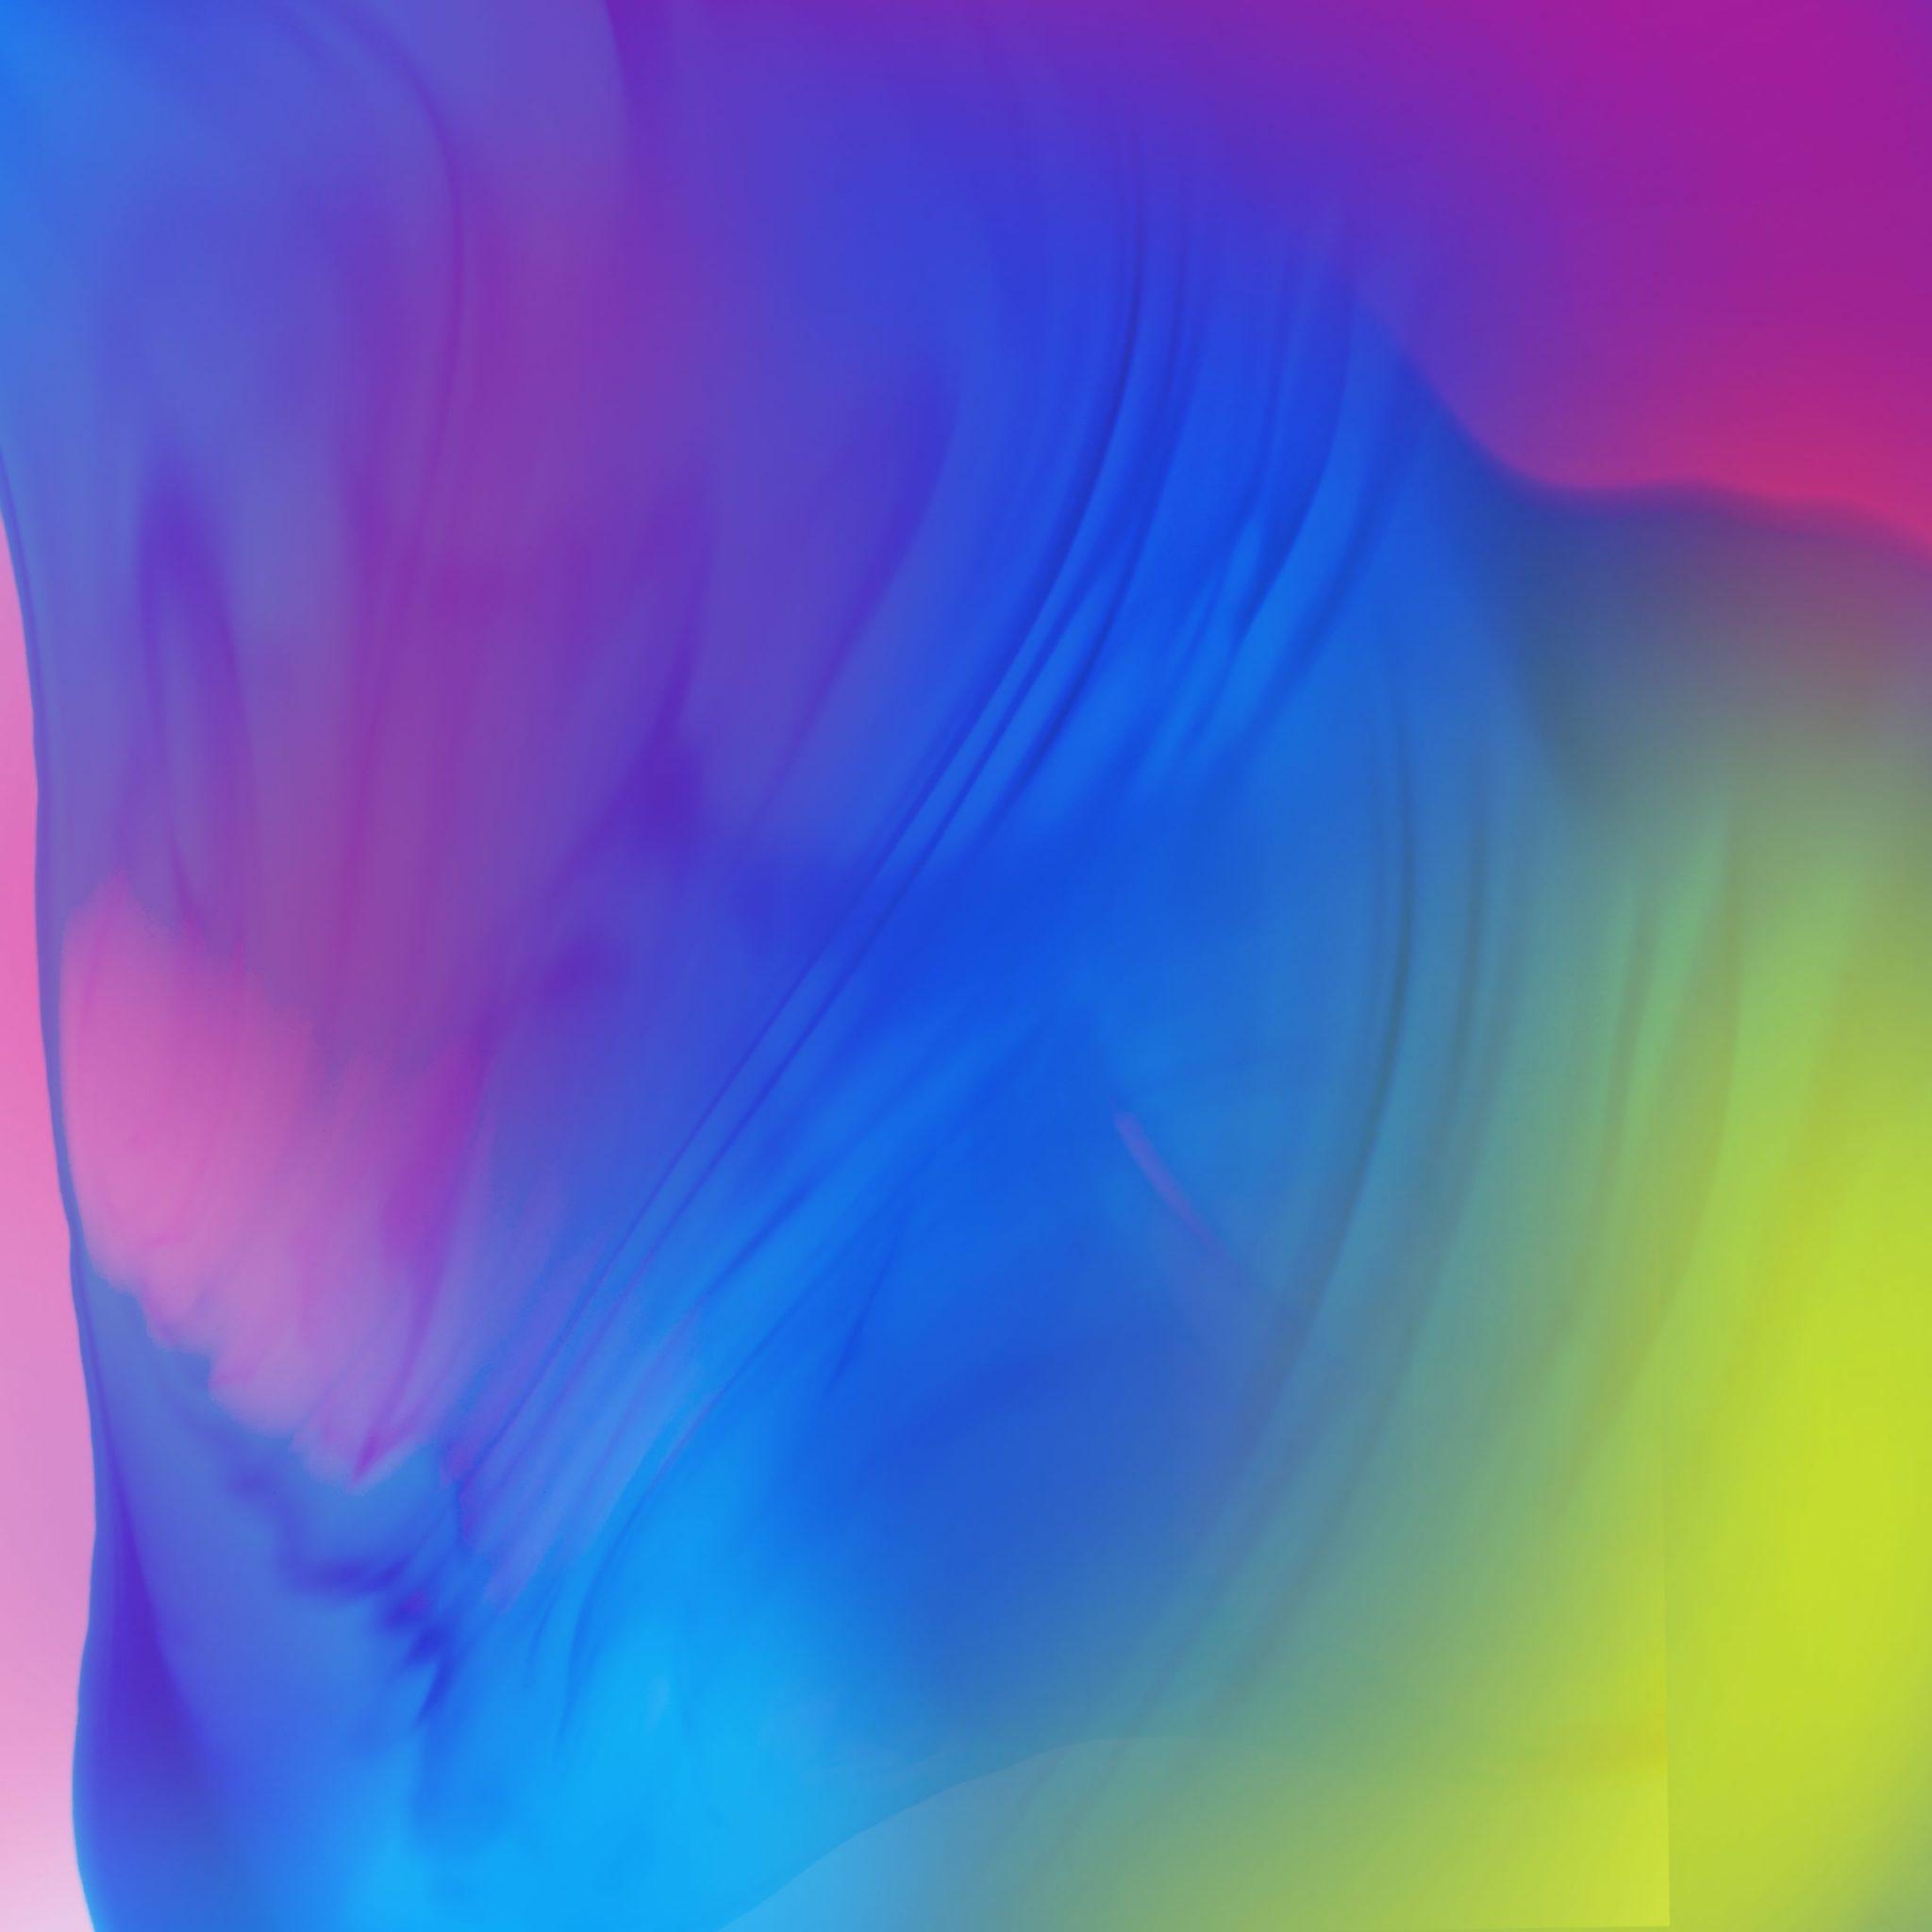 galaxy-m40-wallpaper-TechFoogle-03